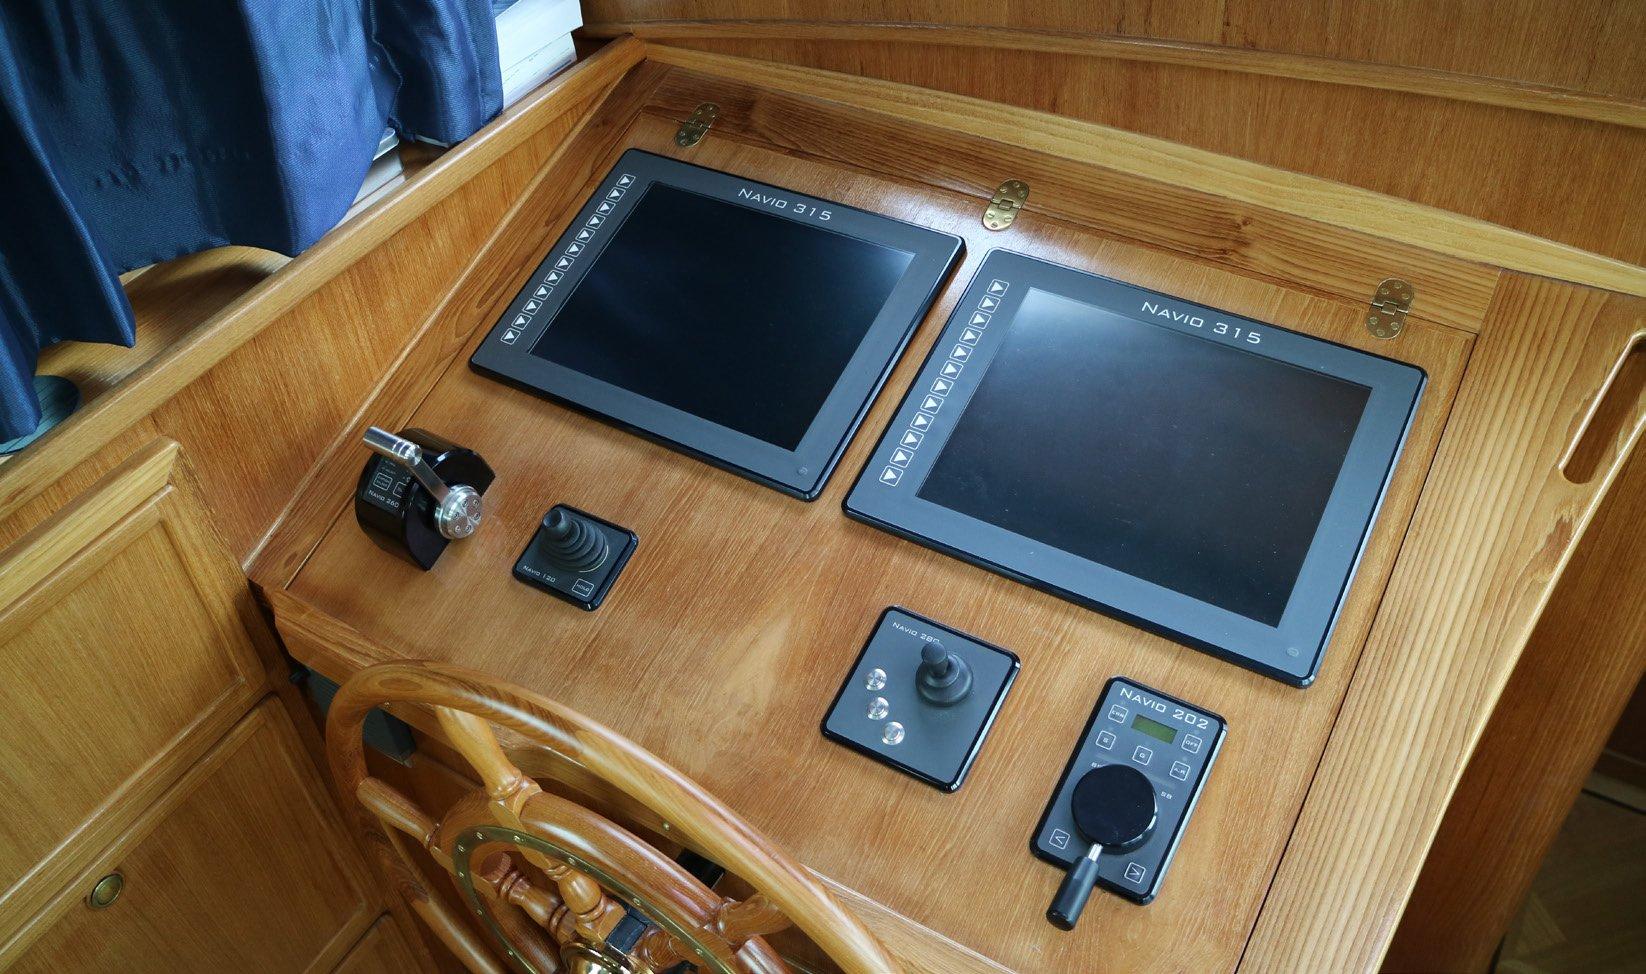 NAVIO control systems